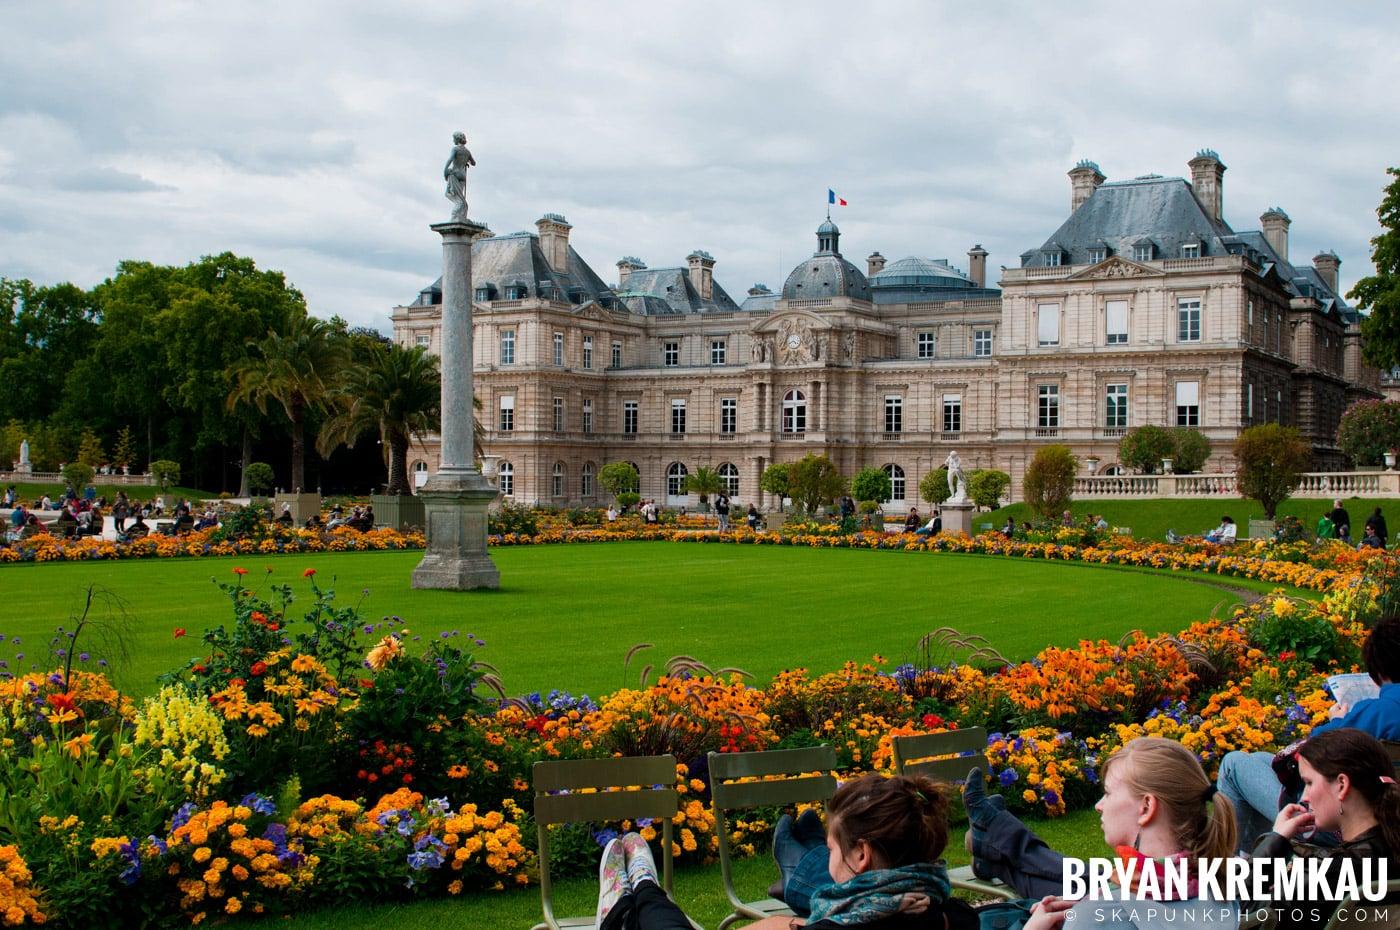 Paris, France Honeymoon - Day 1 - 7.18.11 (45)